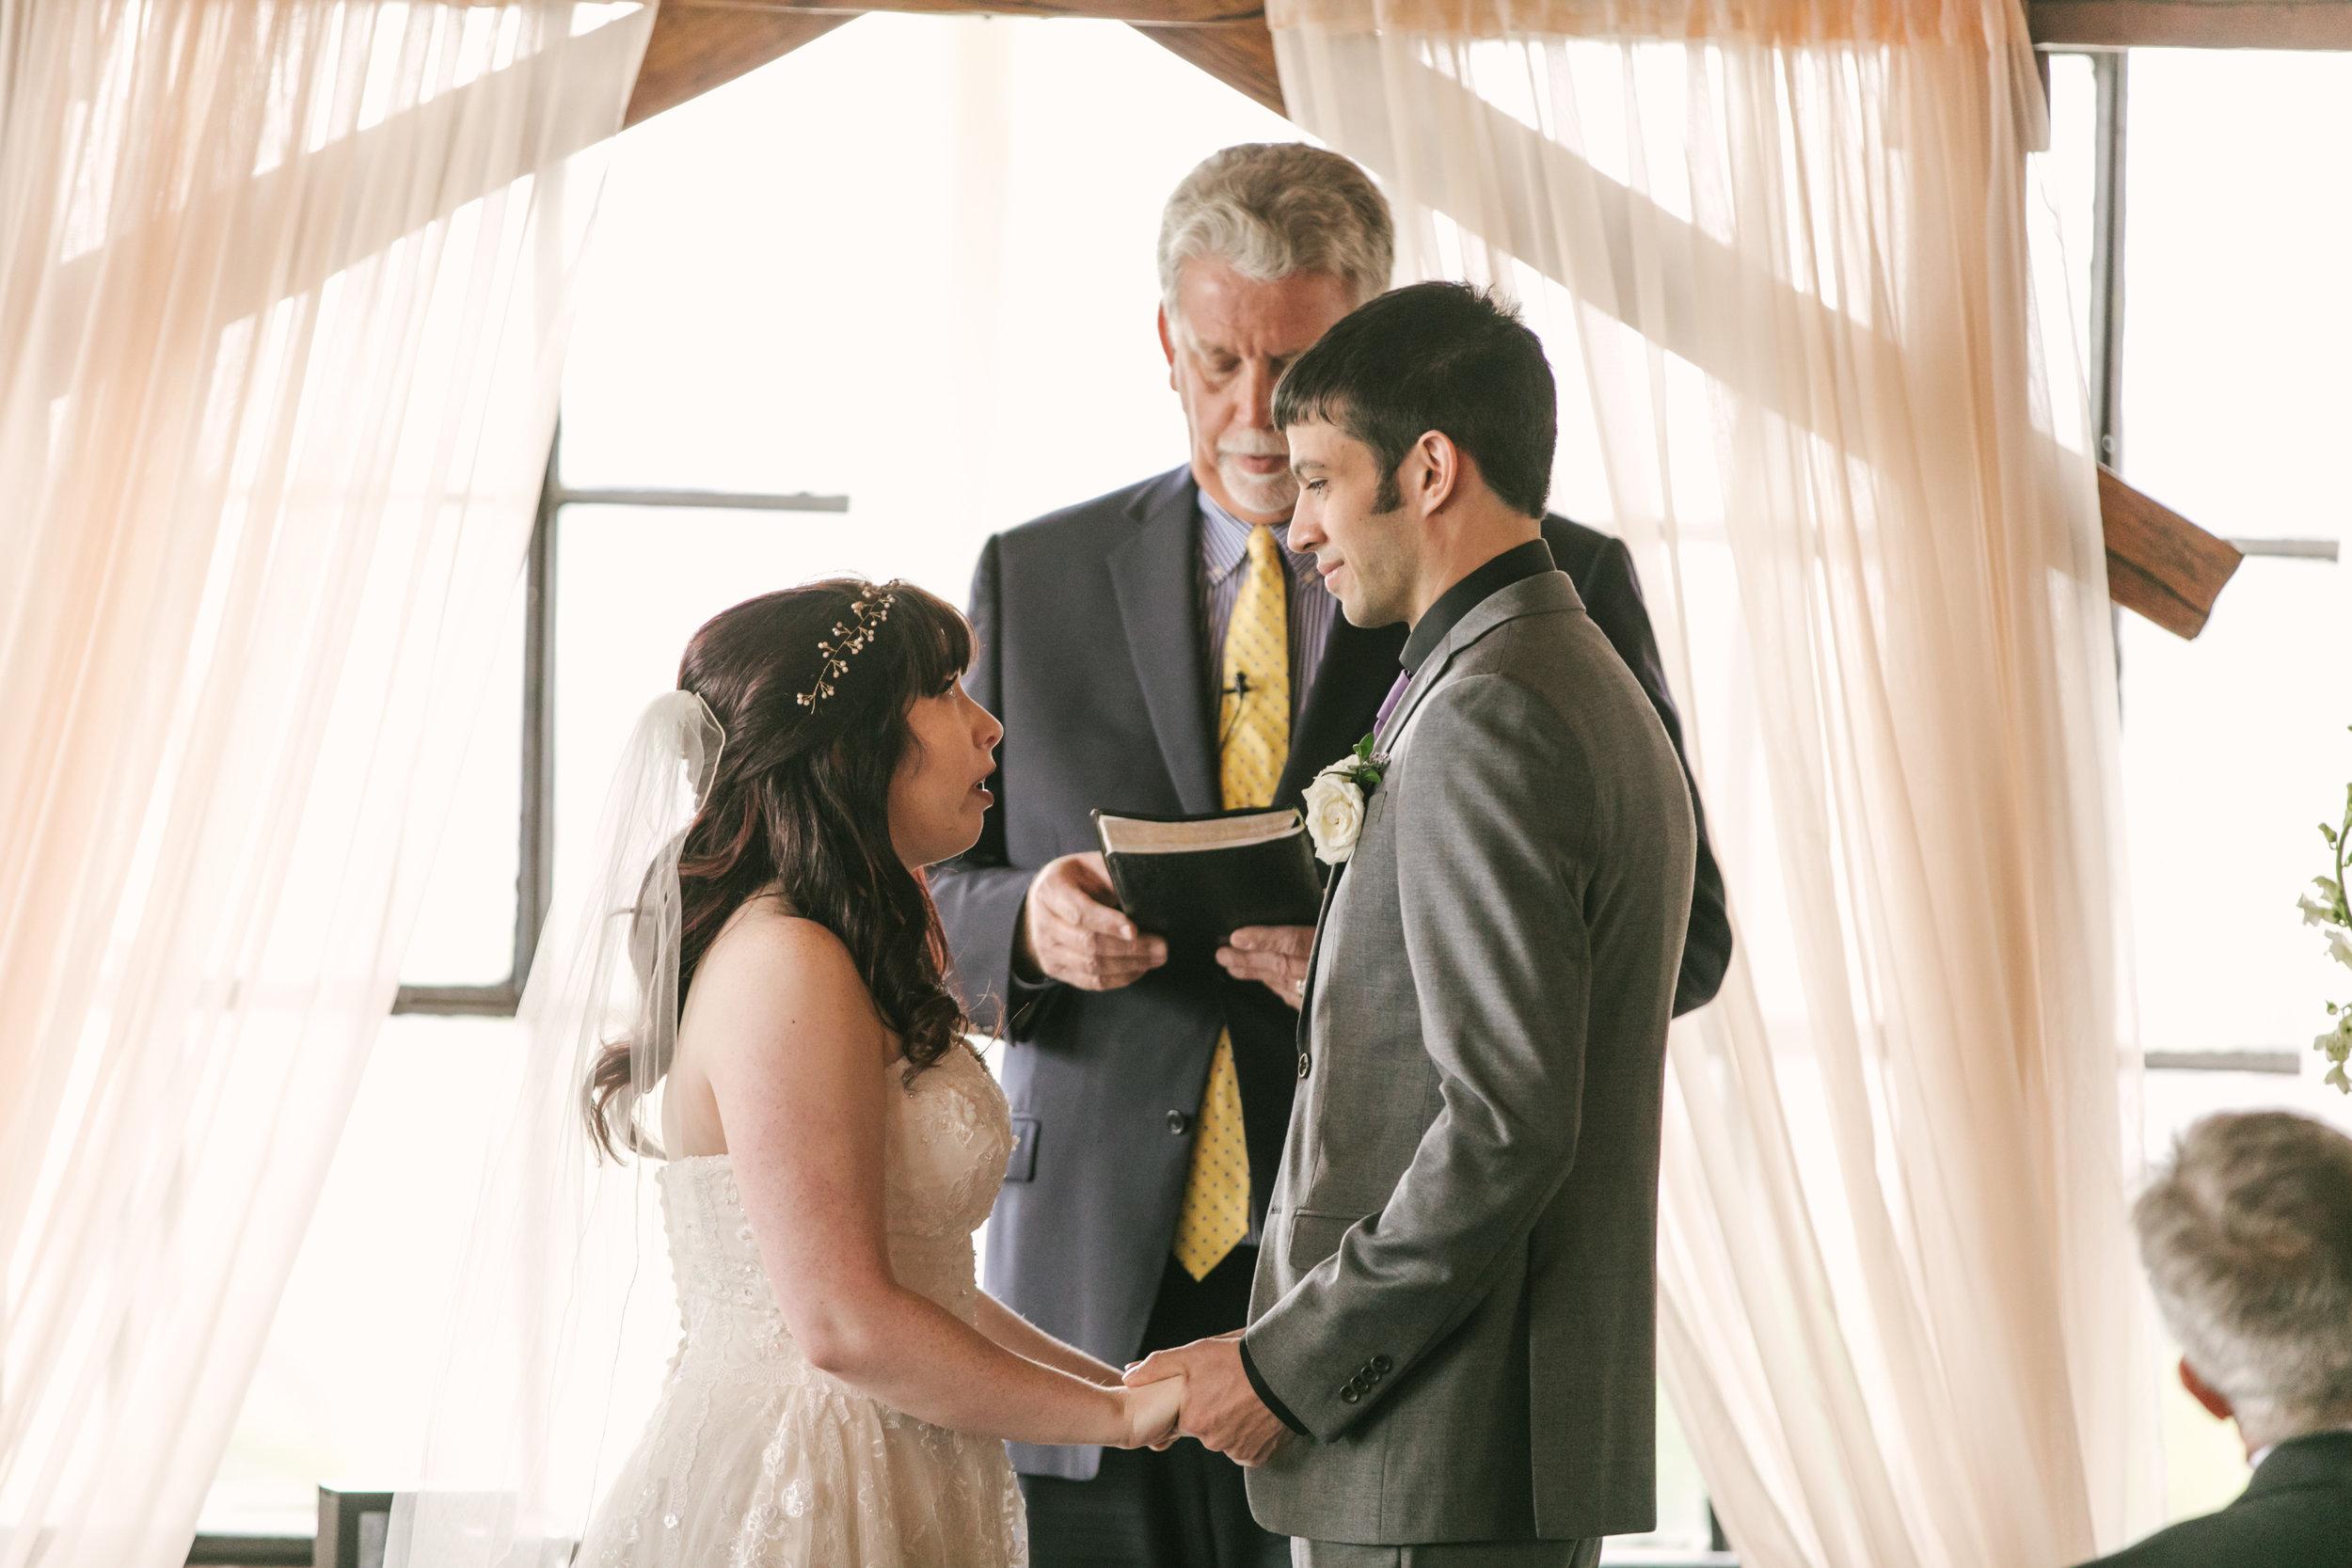 525_Colin+Jessica_Wedding.jpg